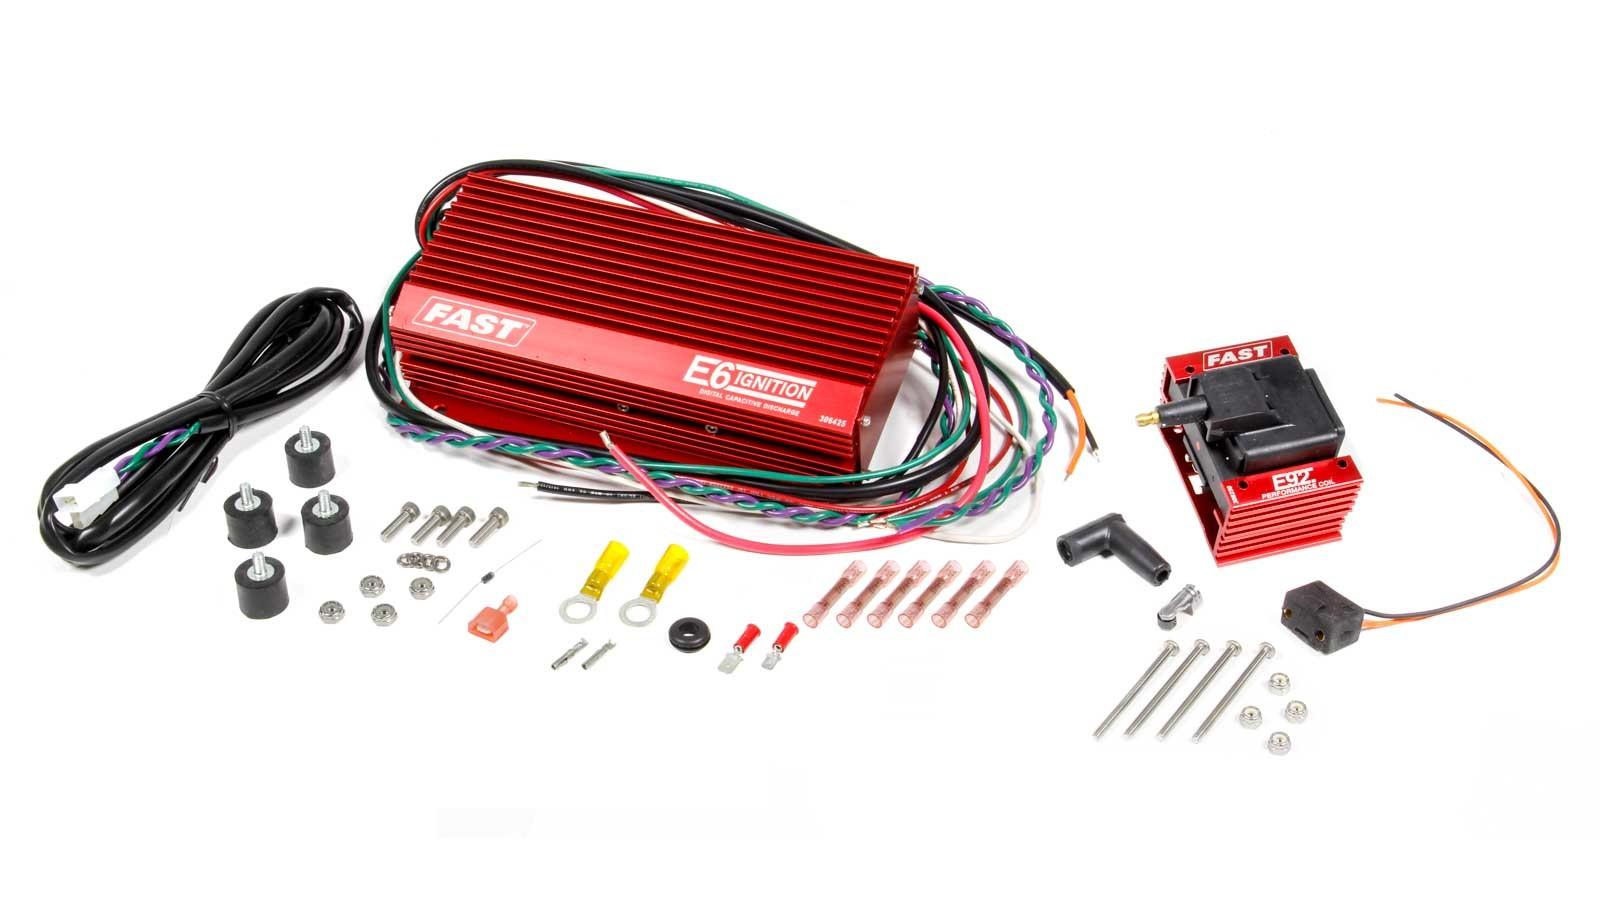 Fast Electronics 306401 Ignition Box, E6, Digital, CD Ignition, Multi-Spark, 450V, Rev Limiter, Coil Included, Kit